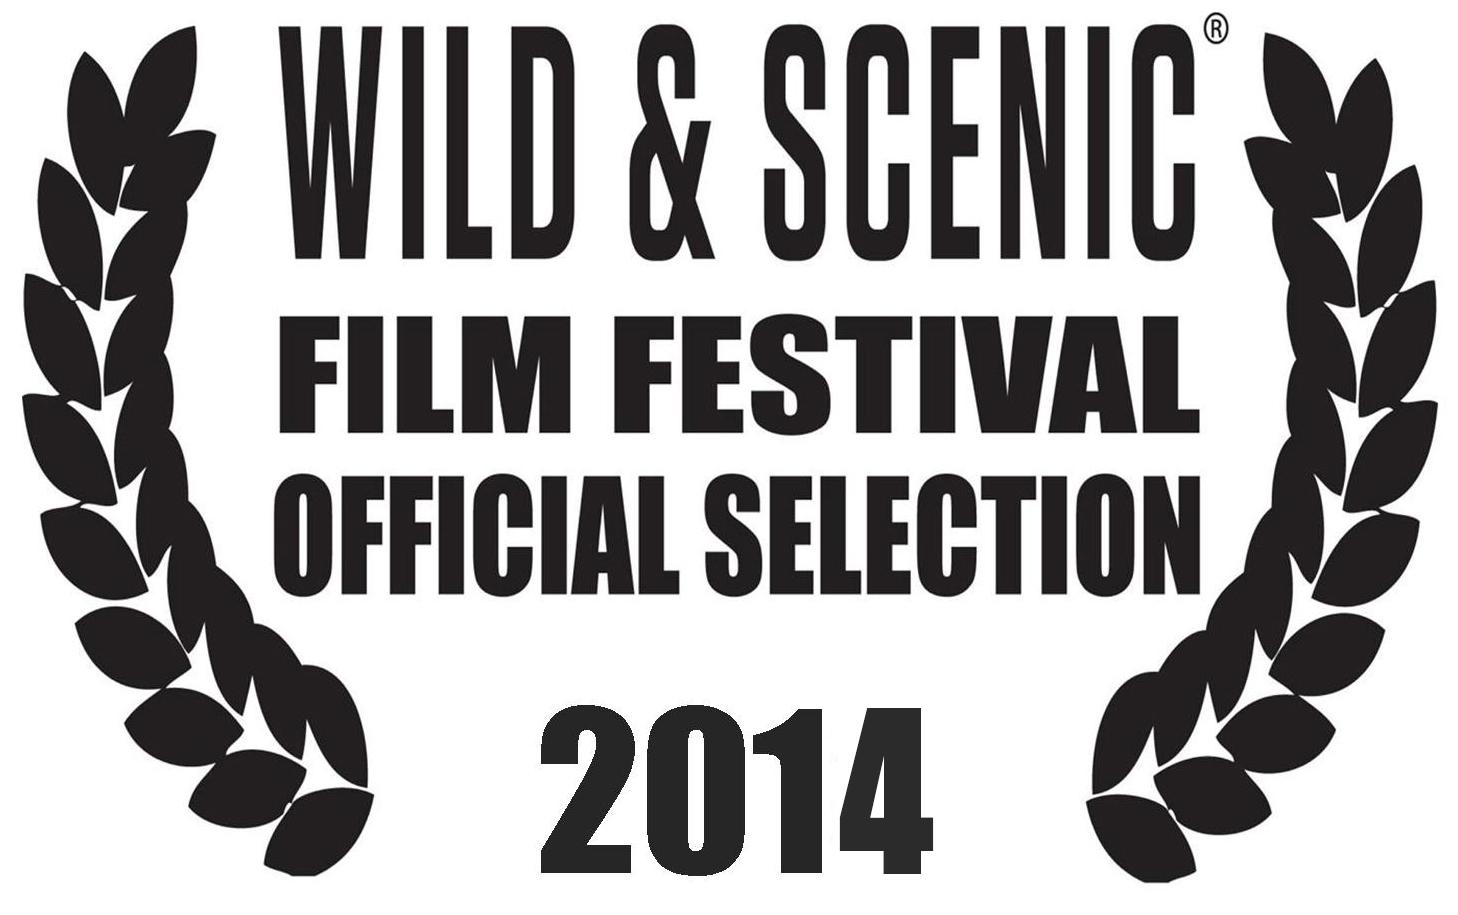 2014-WSFF-Official-Selection-laurel.jpg